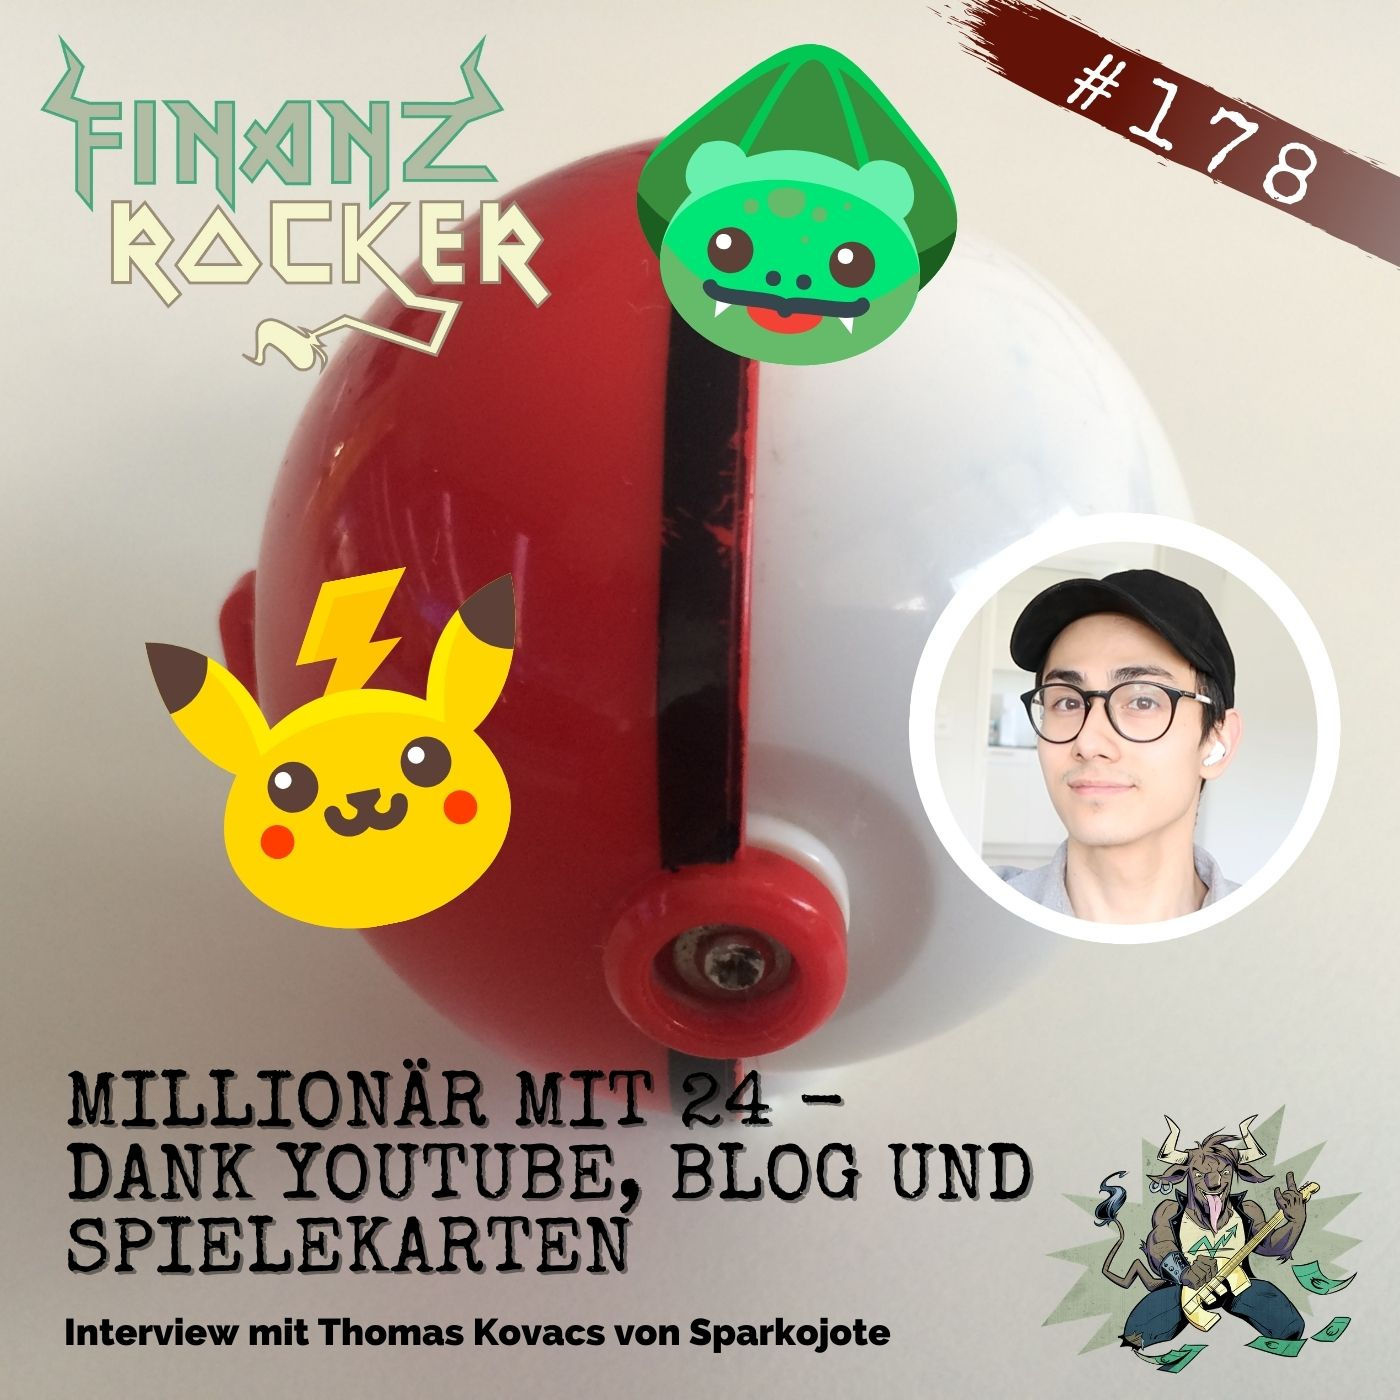 "Folge 178: ""Millionär mit 24 - Dank YouTube, Blog & Spielekarten"" - Interview mit Sparkojote Thomas Kovacs"